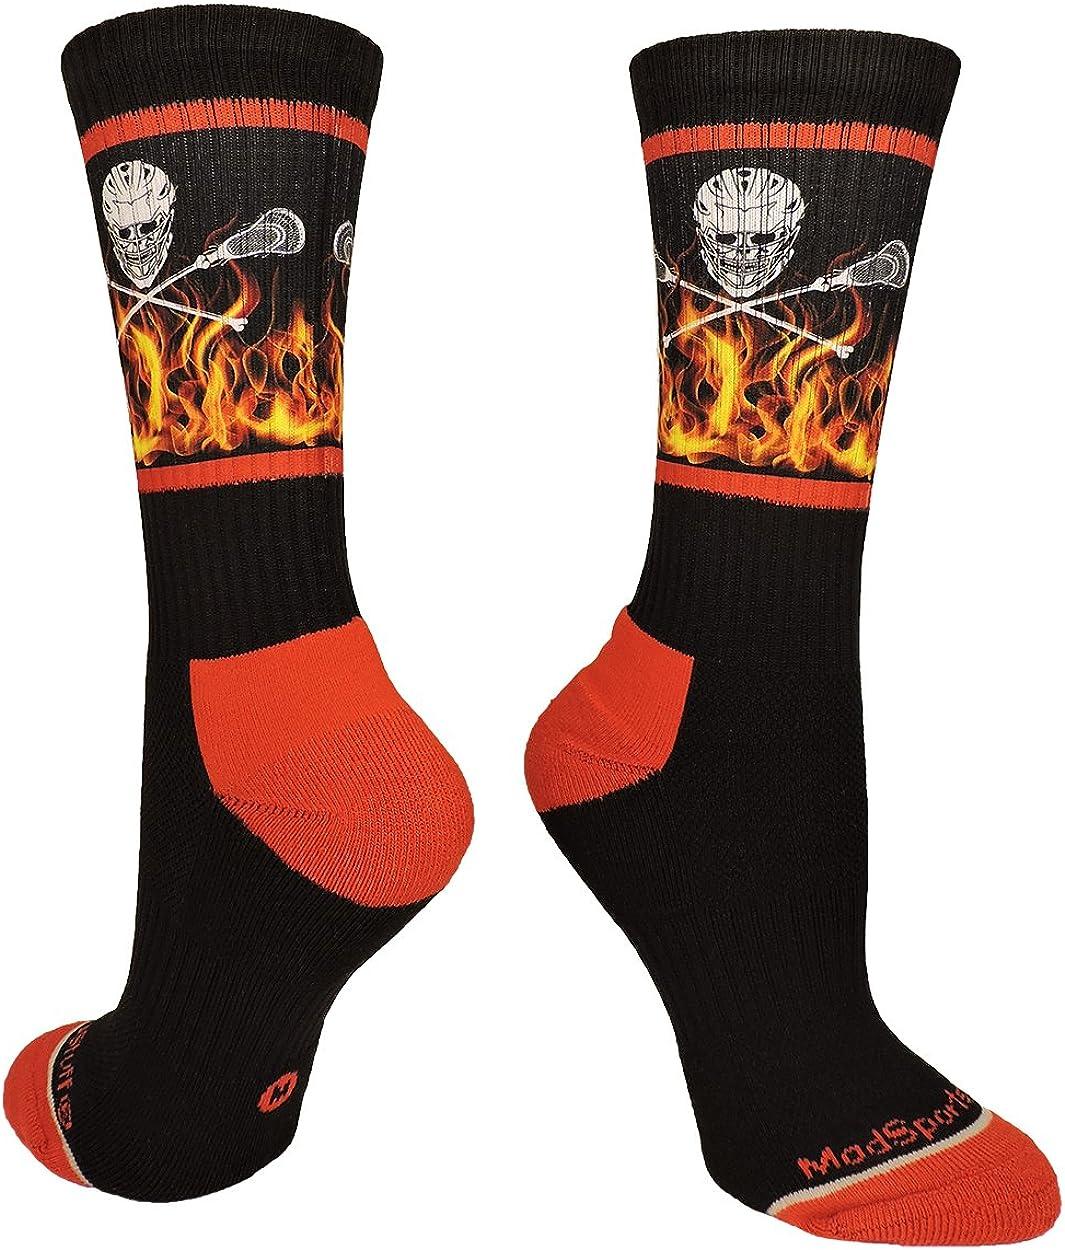 MadSportsStuff Lacrosse Socks with Lacrosse Sticks and Flaming Skull Athletic Crew Socks